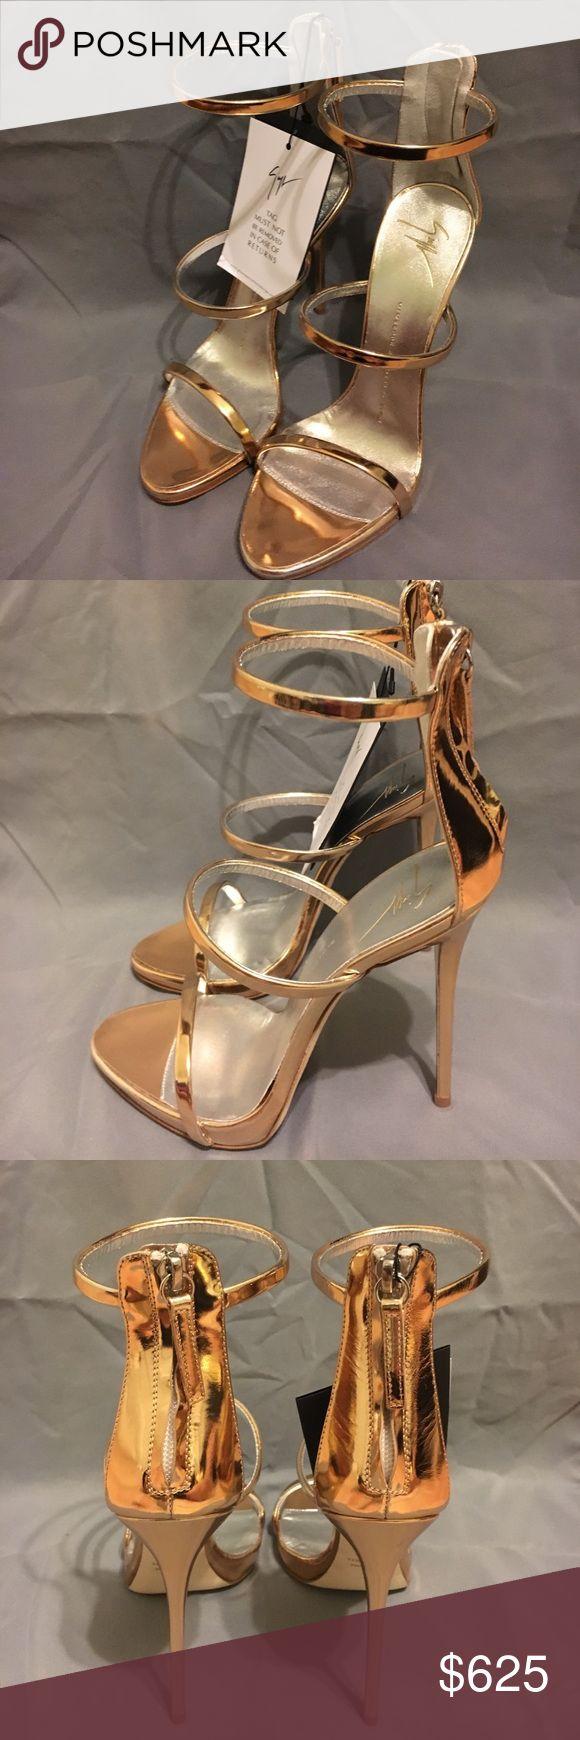 Giuseppe Zanotti stilettos Gold strappy high heel stilettos Giuseppe Zanotti Shoes Heels